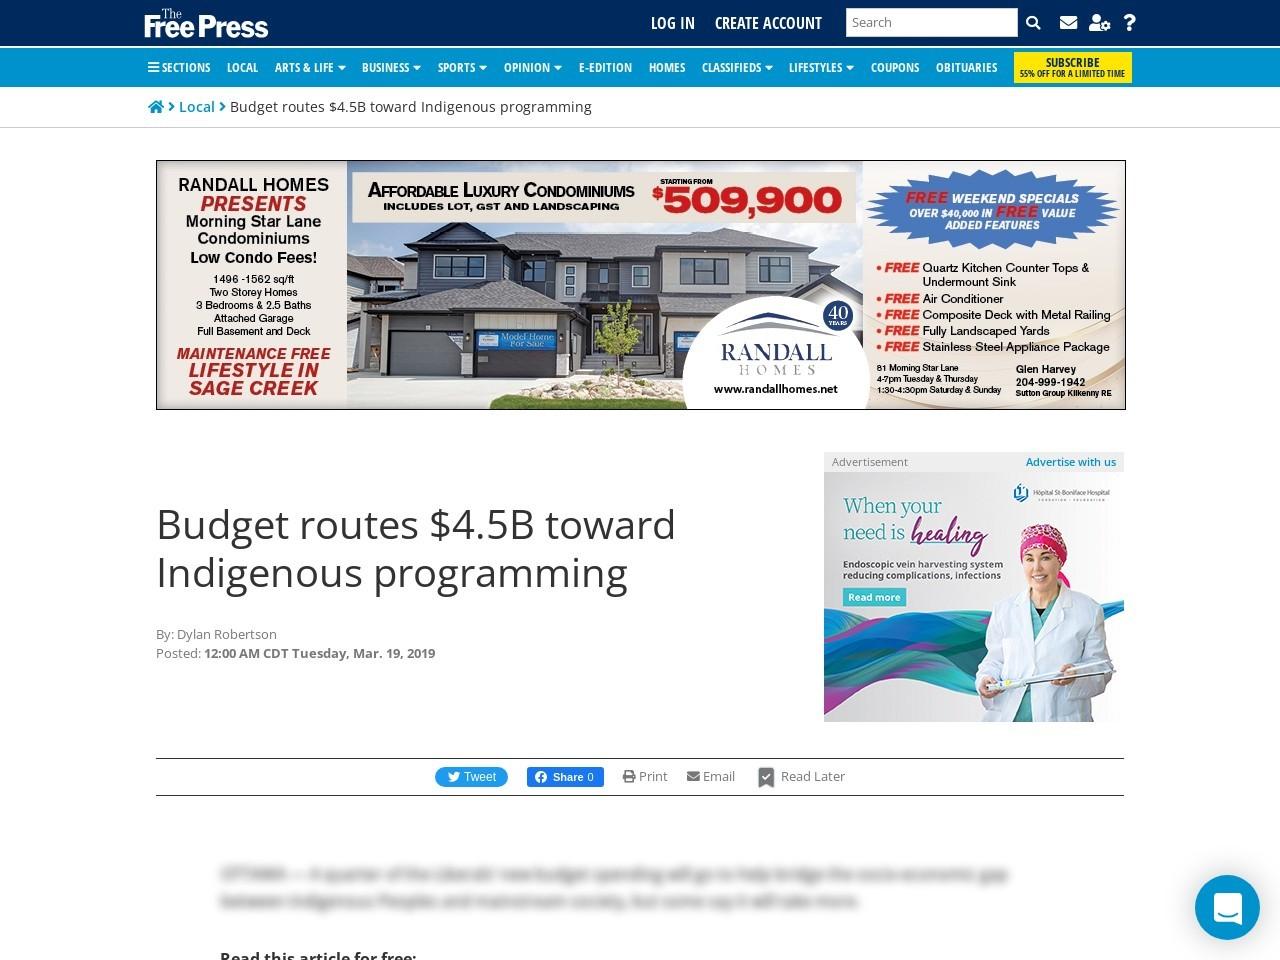 Budget routes $4.5B toward Indigenous programming